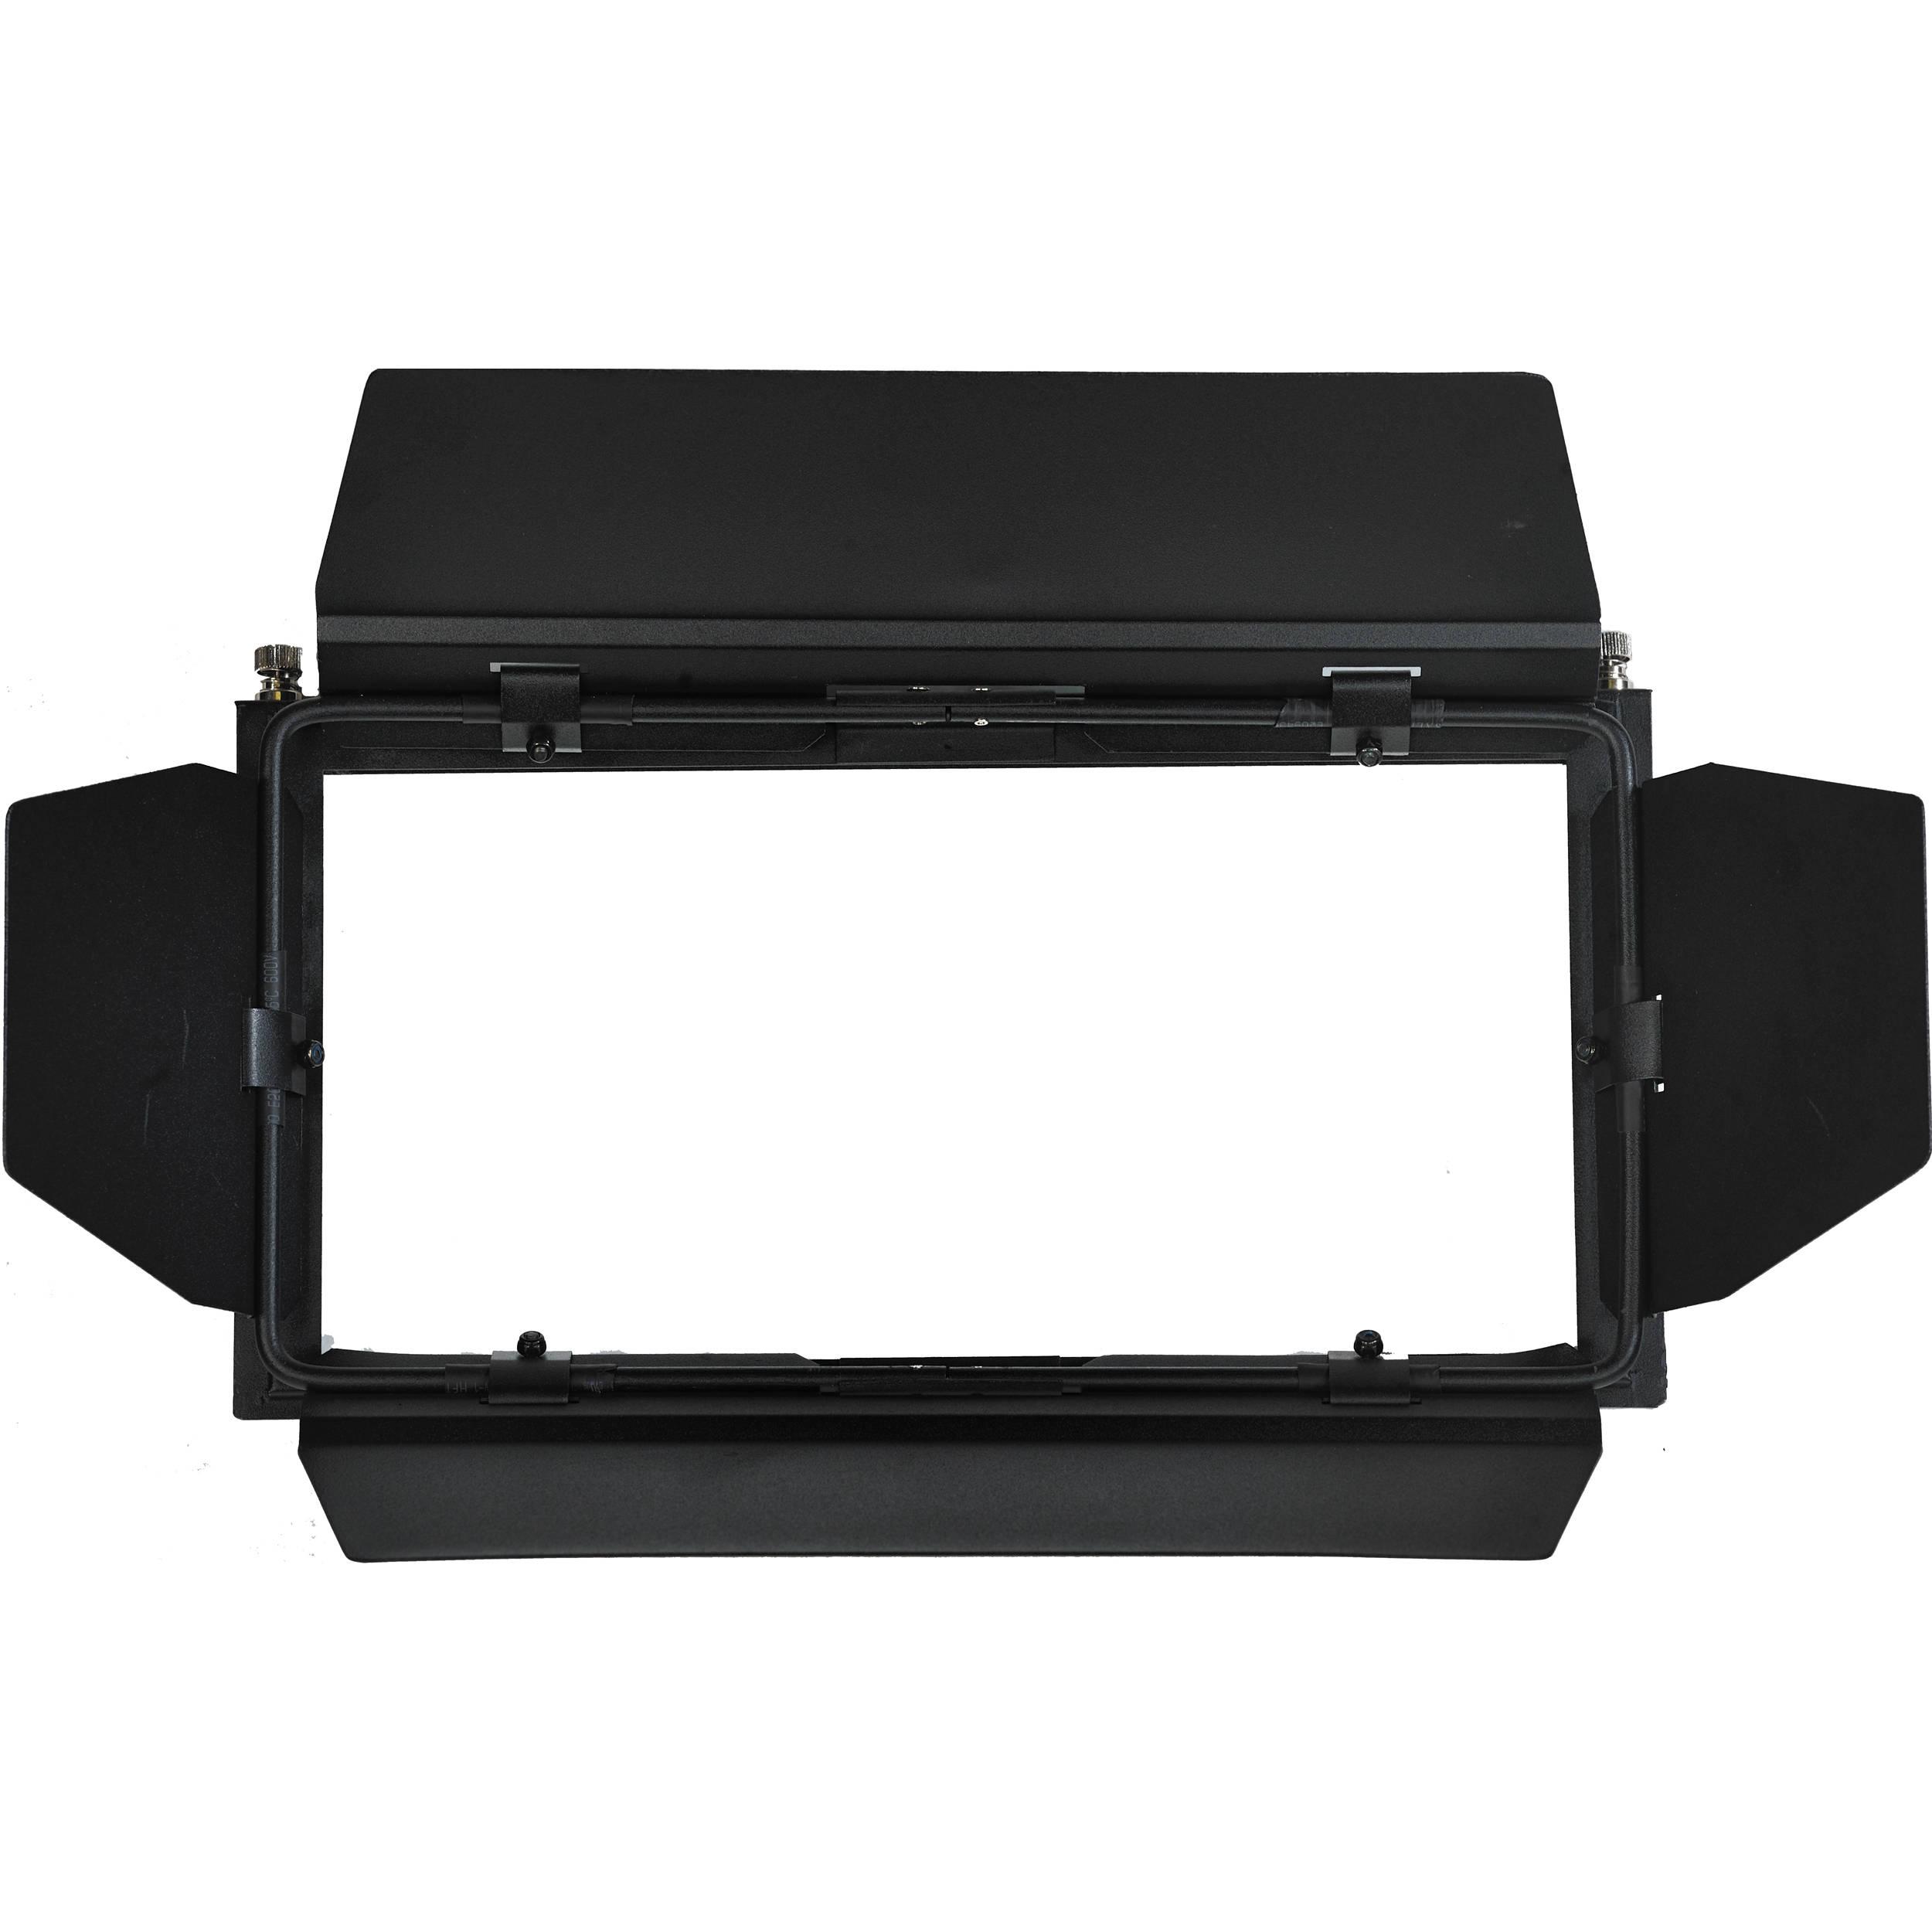 Lighting barndoors bh photo video dracast barndoors for led500 eventshaper